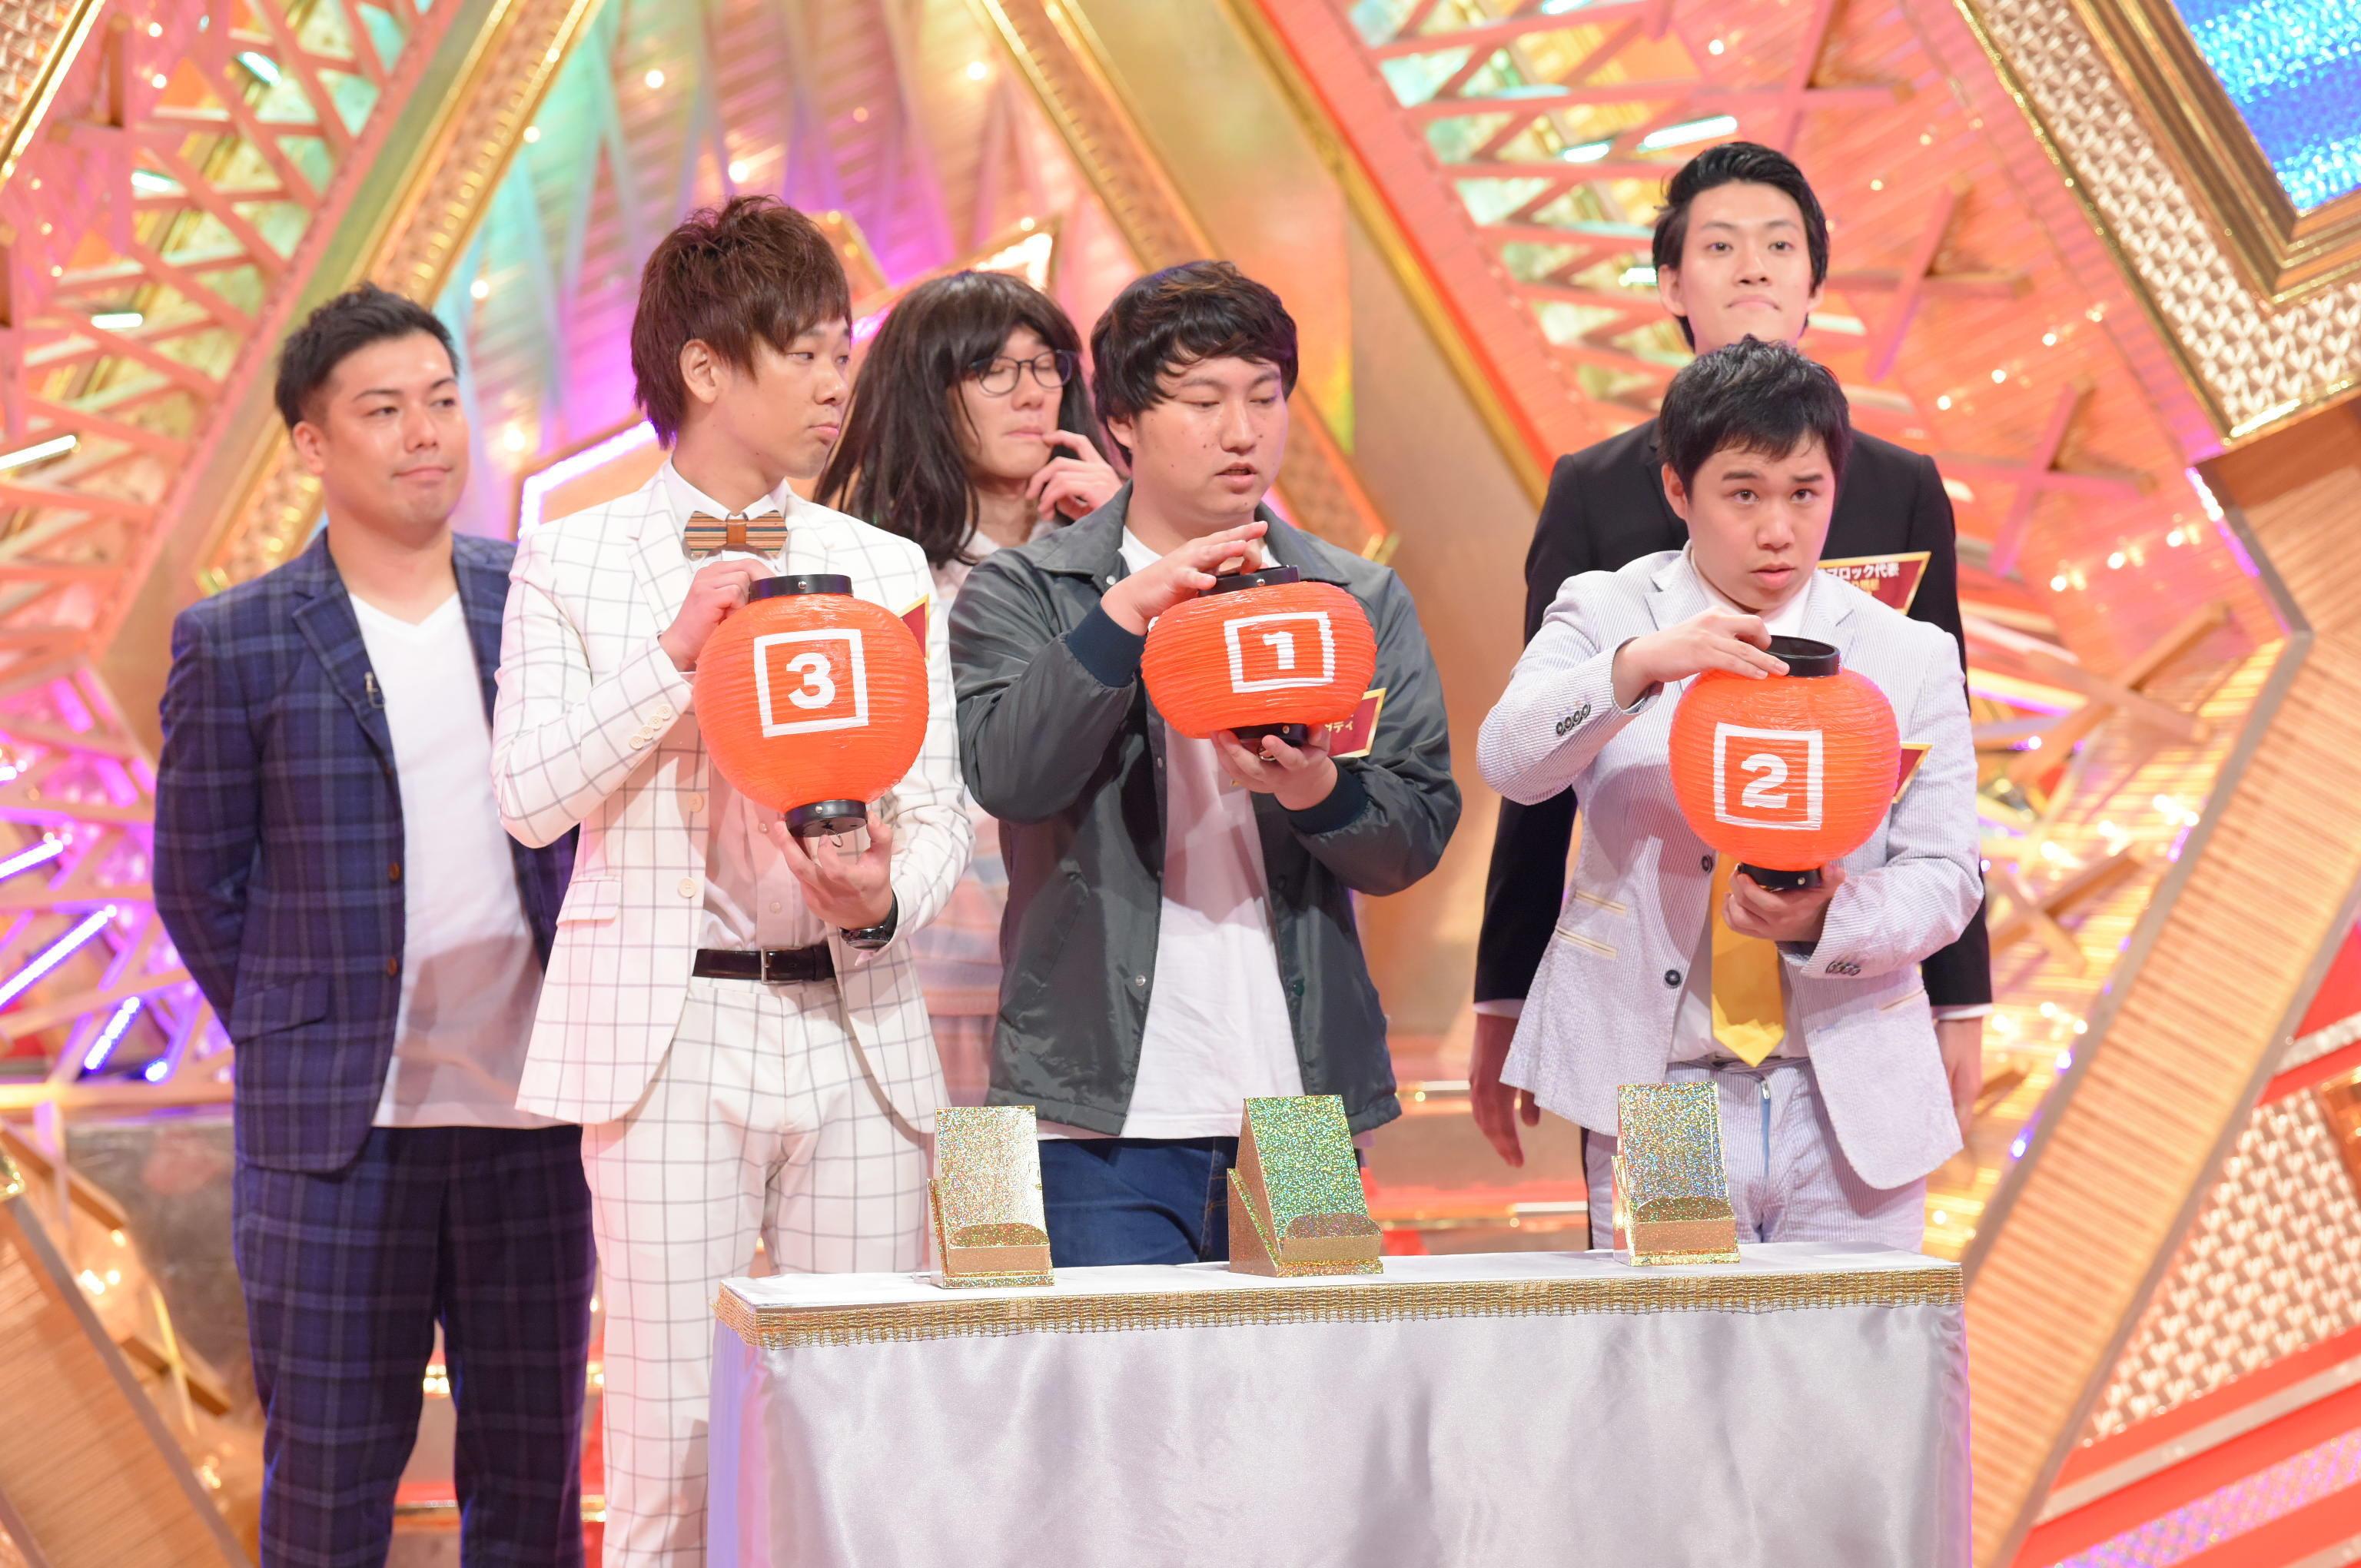 http://news.yoshimoto.co.jp/20170712104414-a077715176aae40e53a368dc38990d2175c33d69.jpg